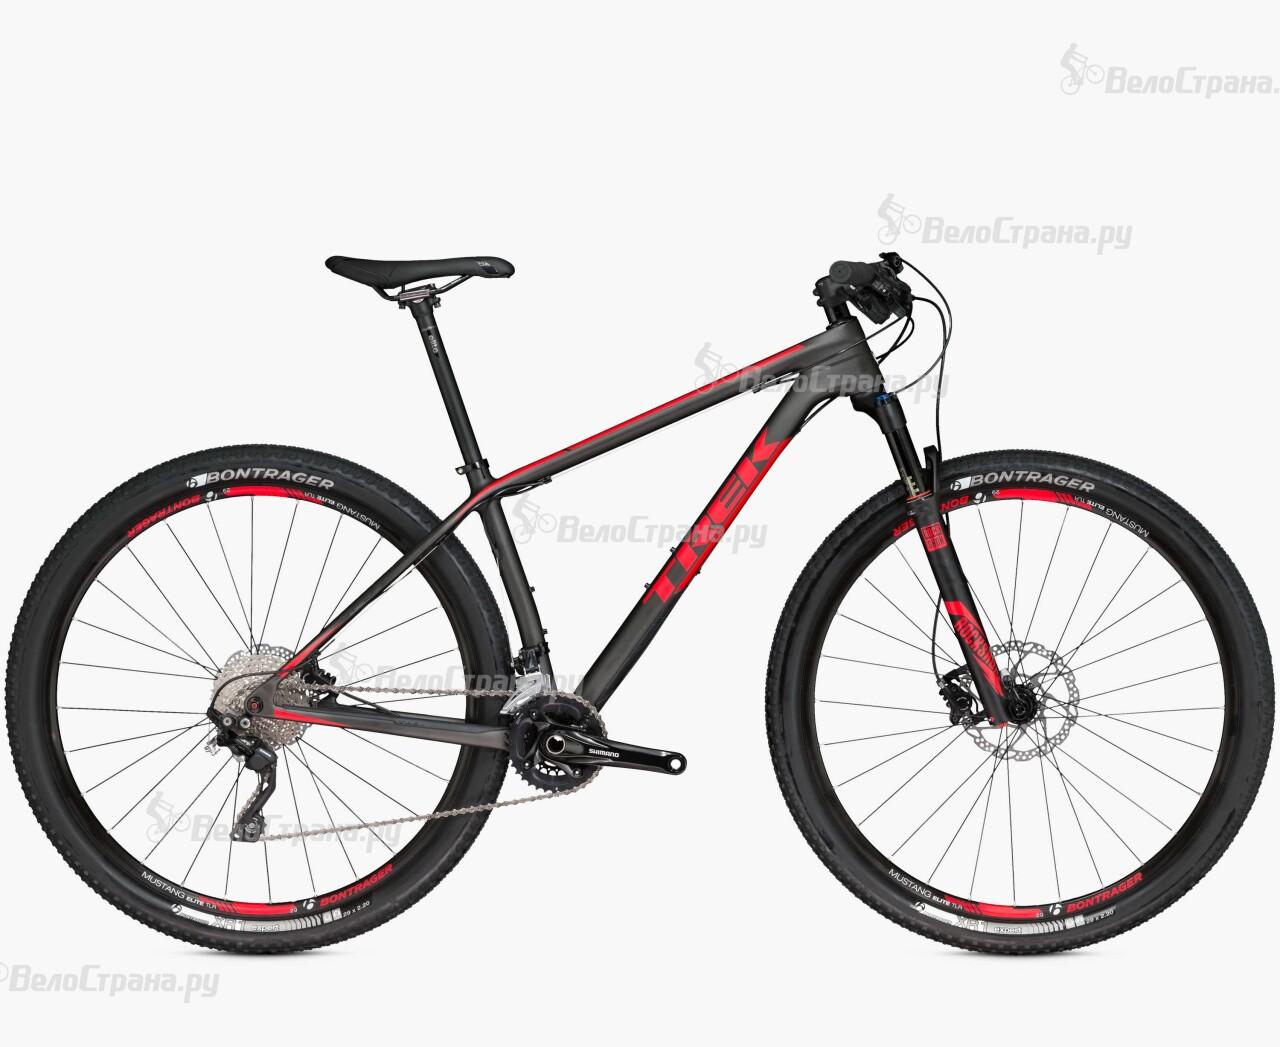 Велосипед Trek Superfly 9.6 27,5 (2016) цены онлайн